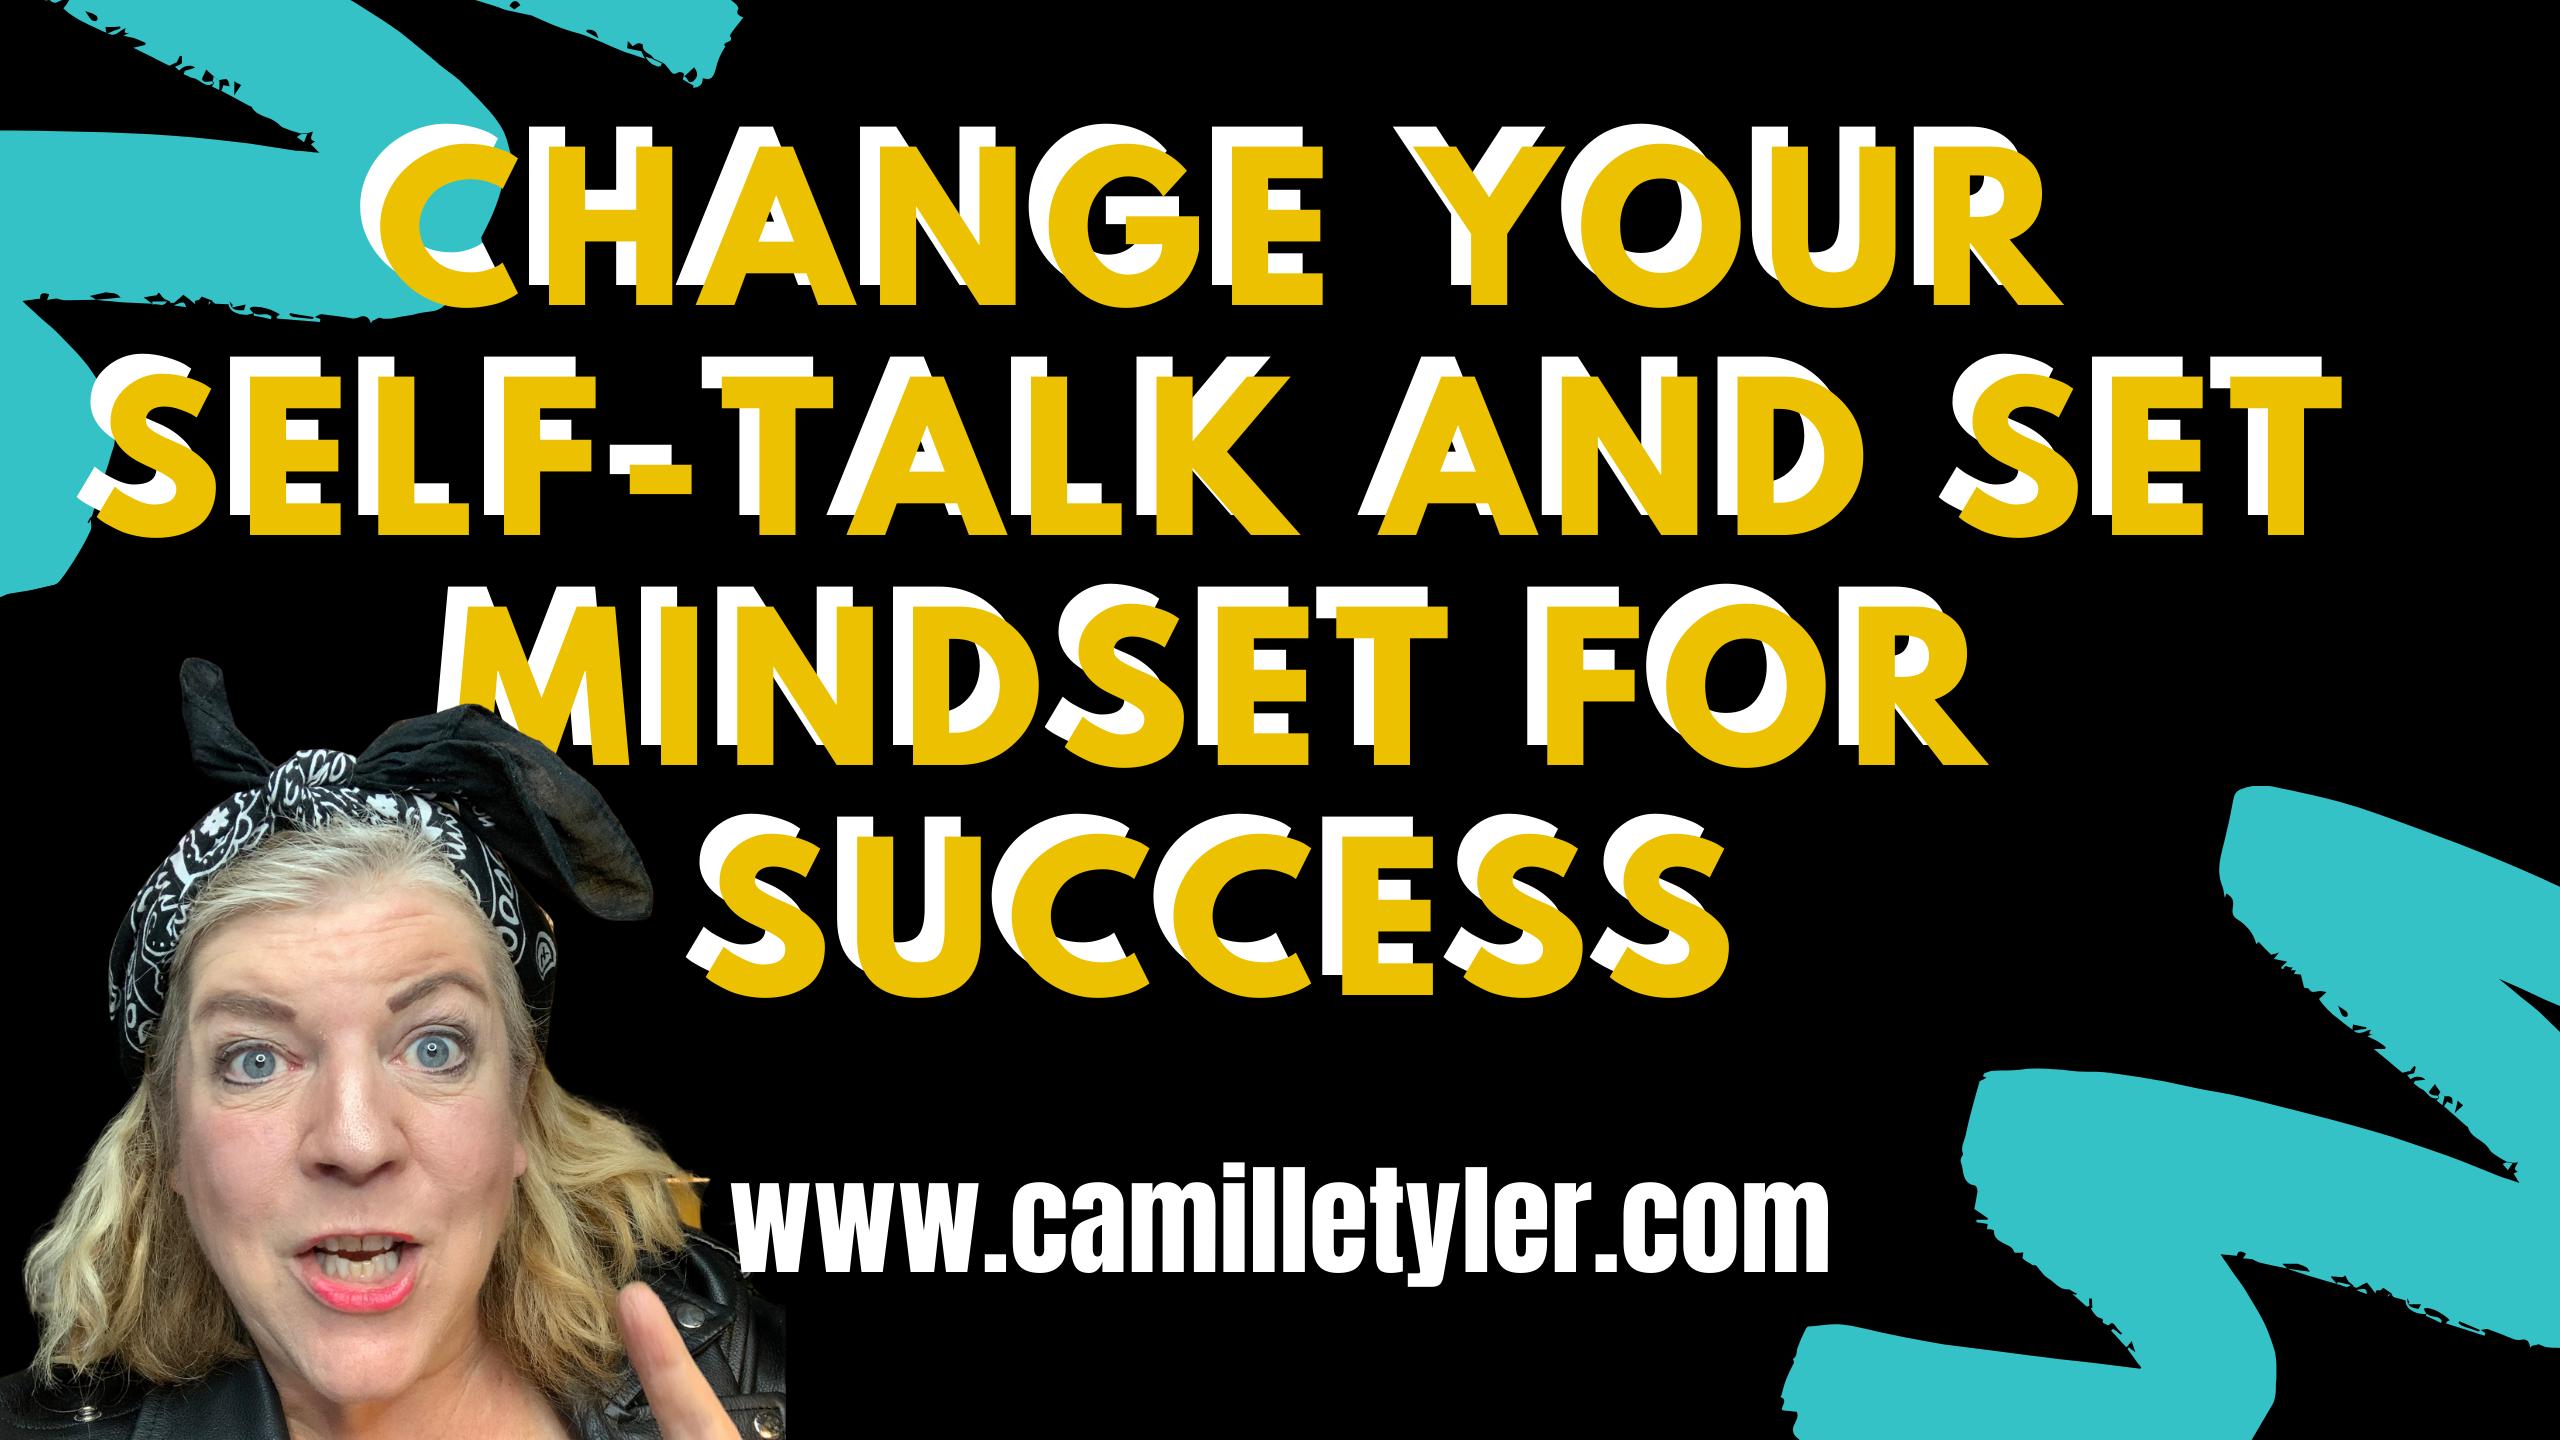 Change your Self-Talk and set Mindset for Success (1